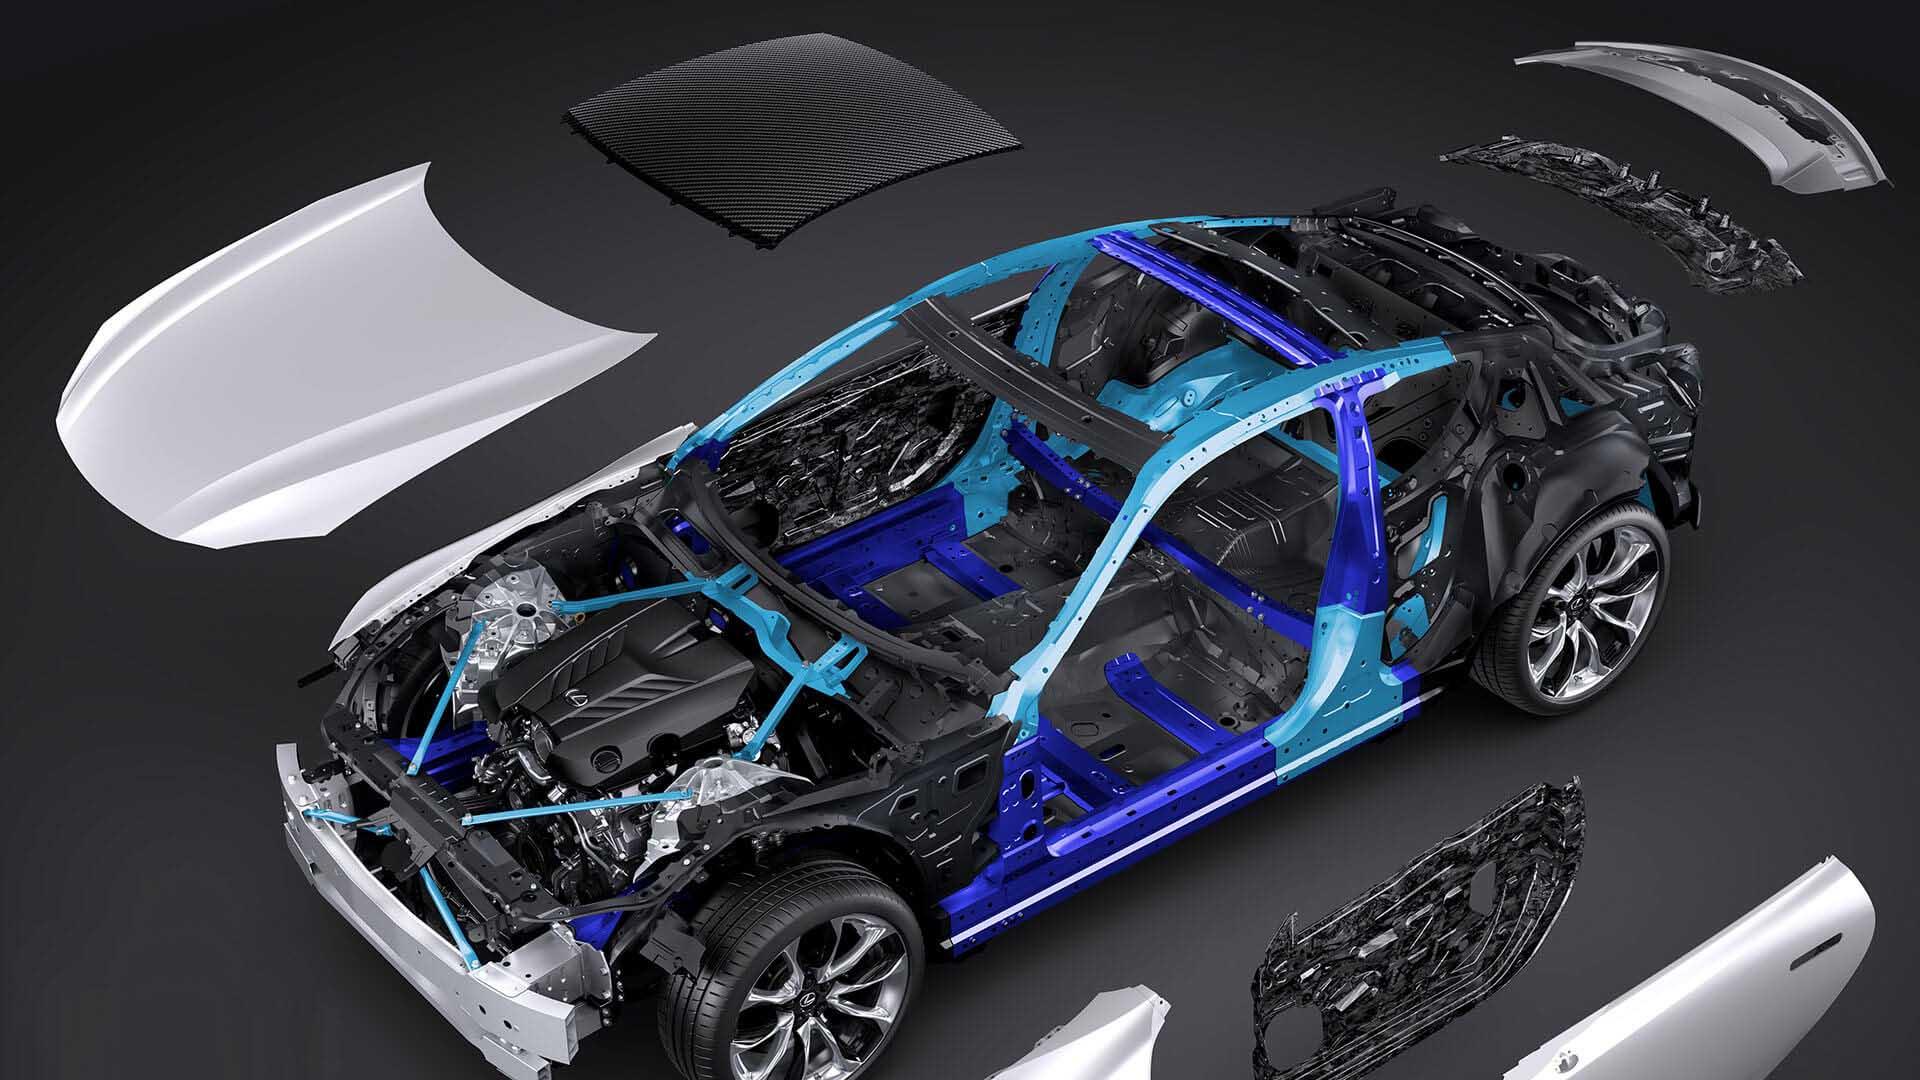 2017 lexus lc 500h features high body rigidity